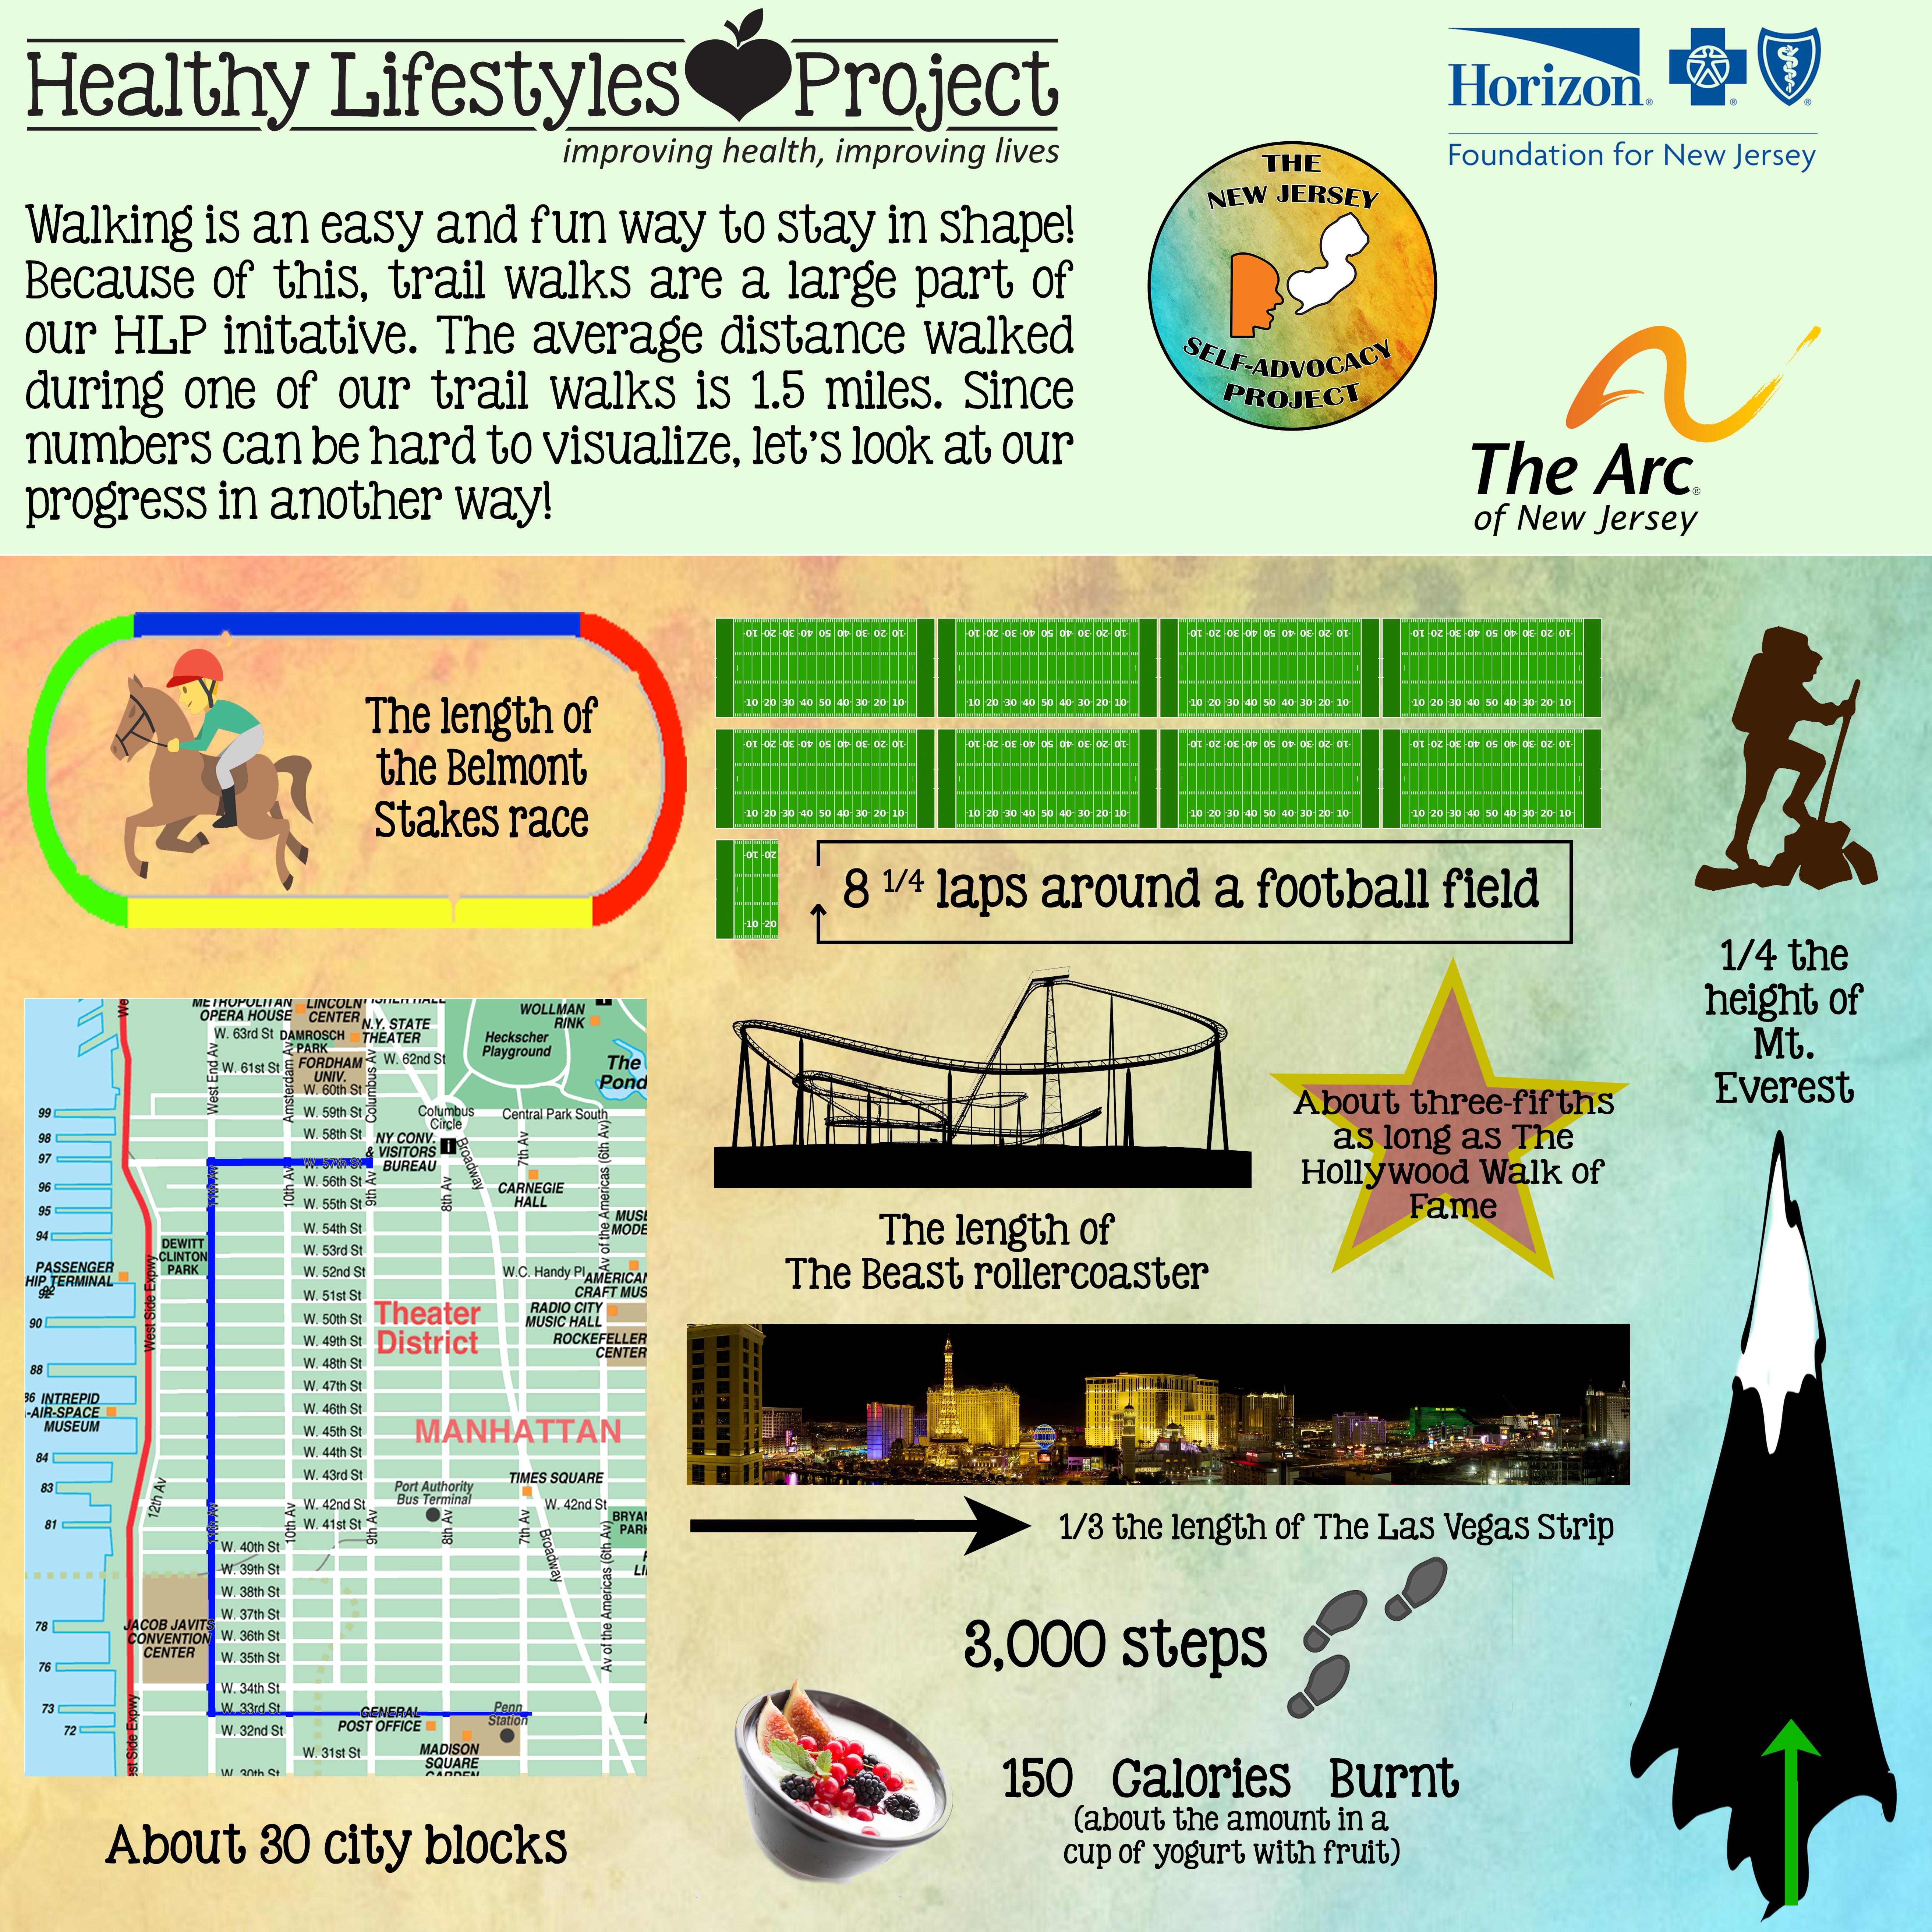 Trail Walk Infographic